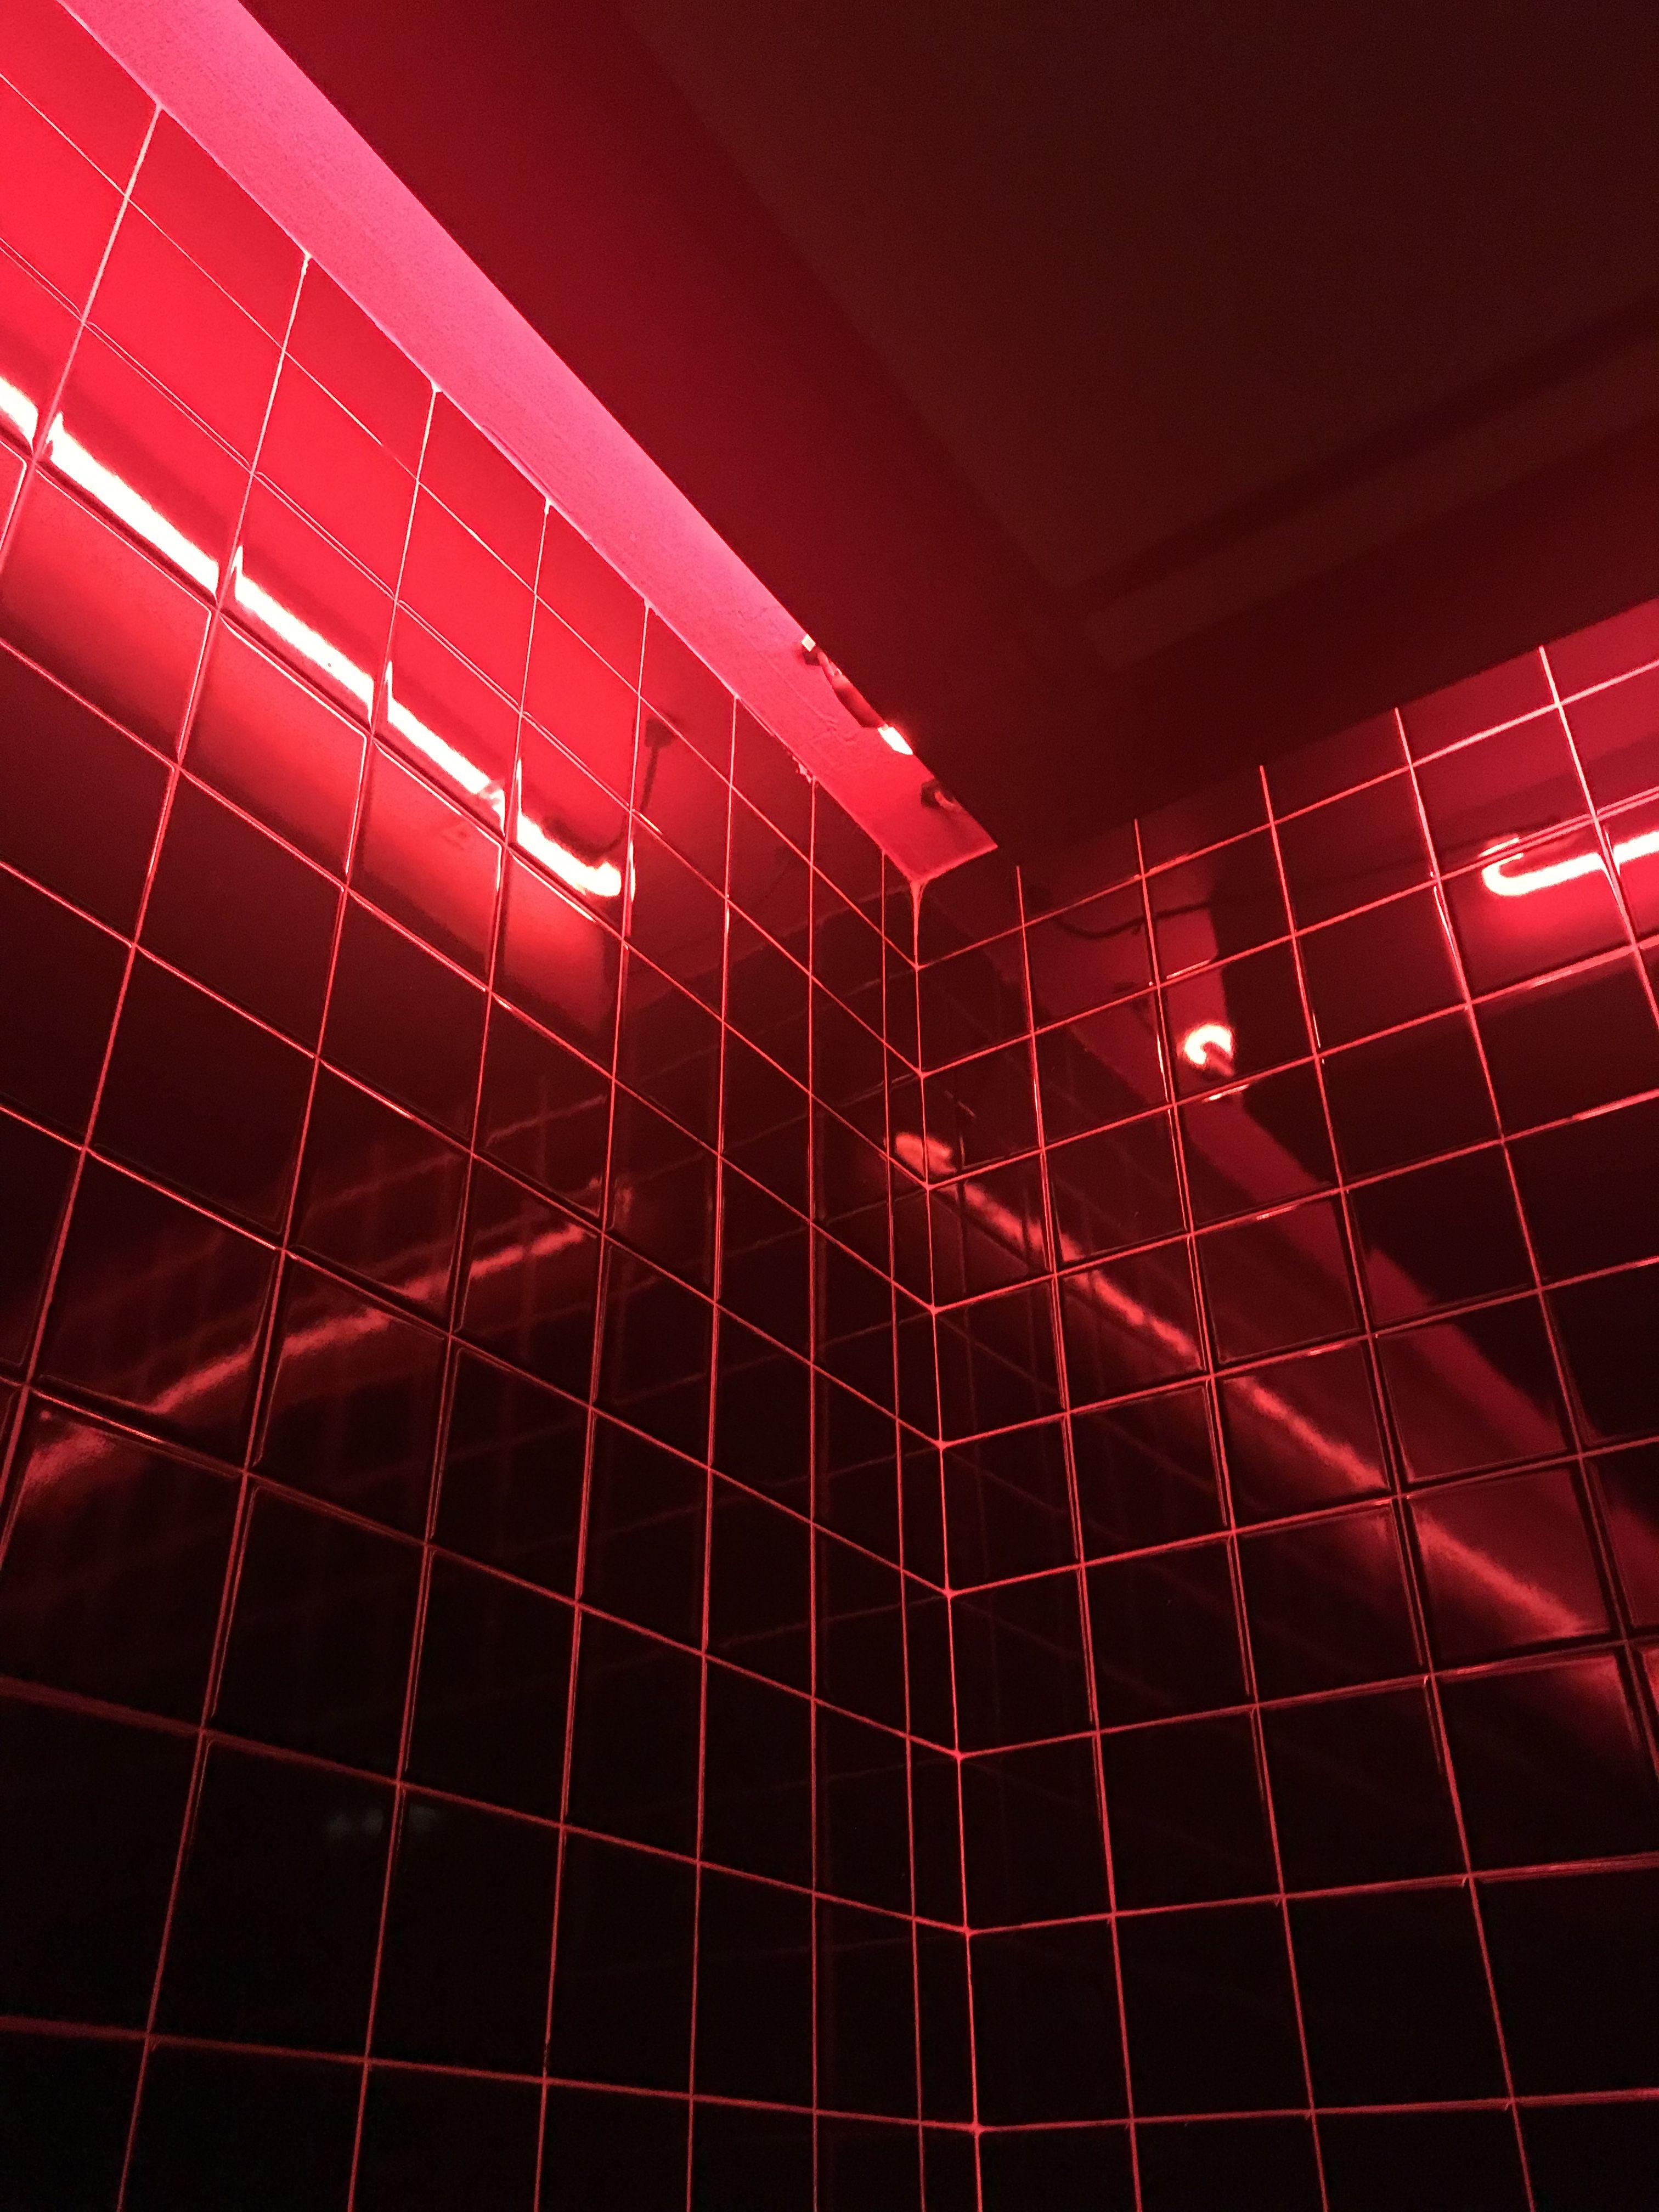 red aesthetic lights Red aesthetic, Aesthetic colors